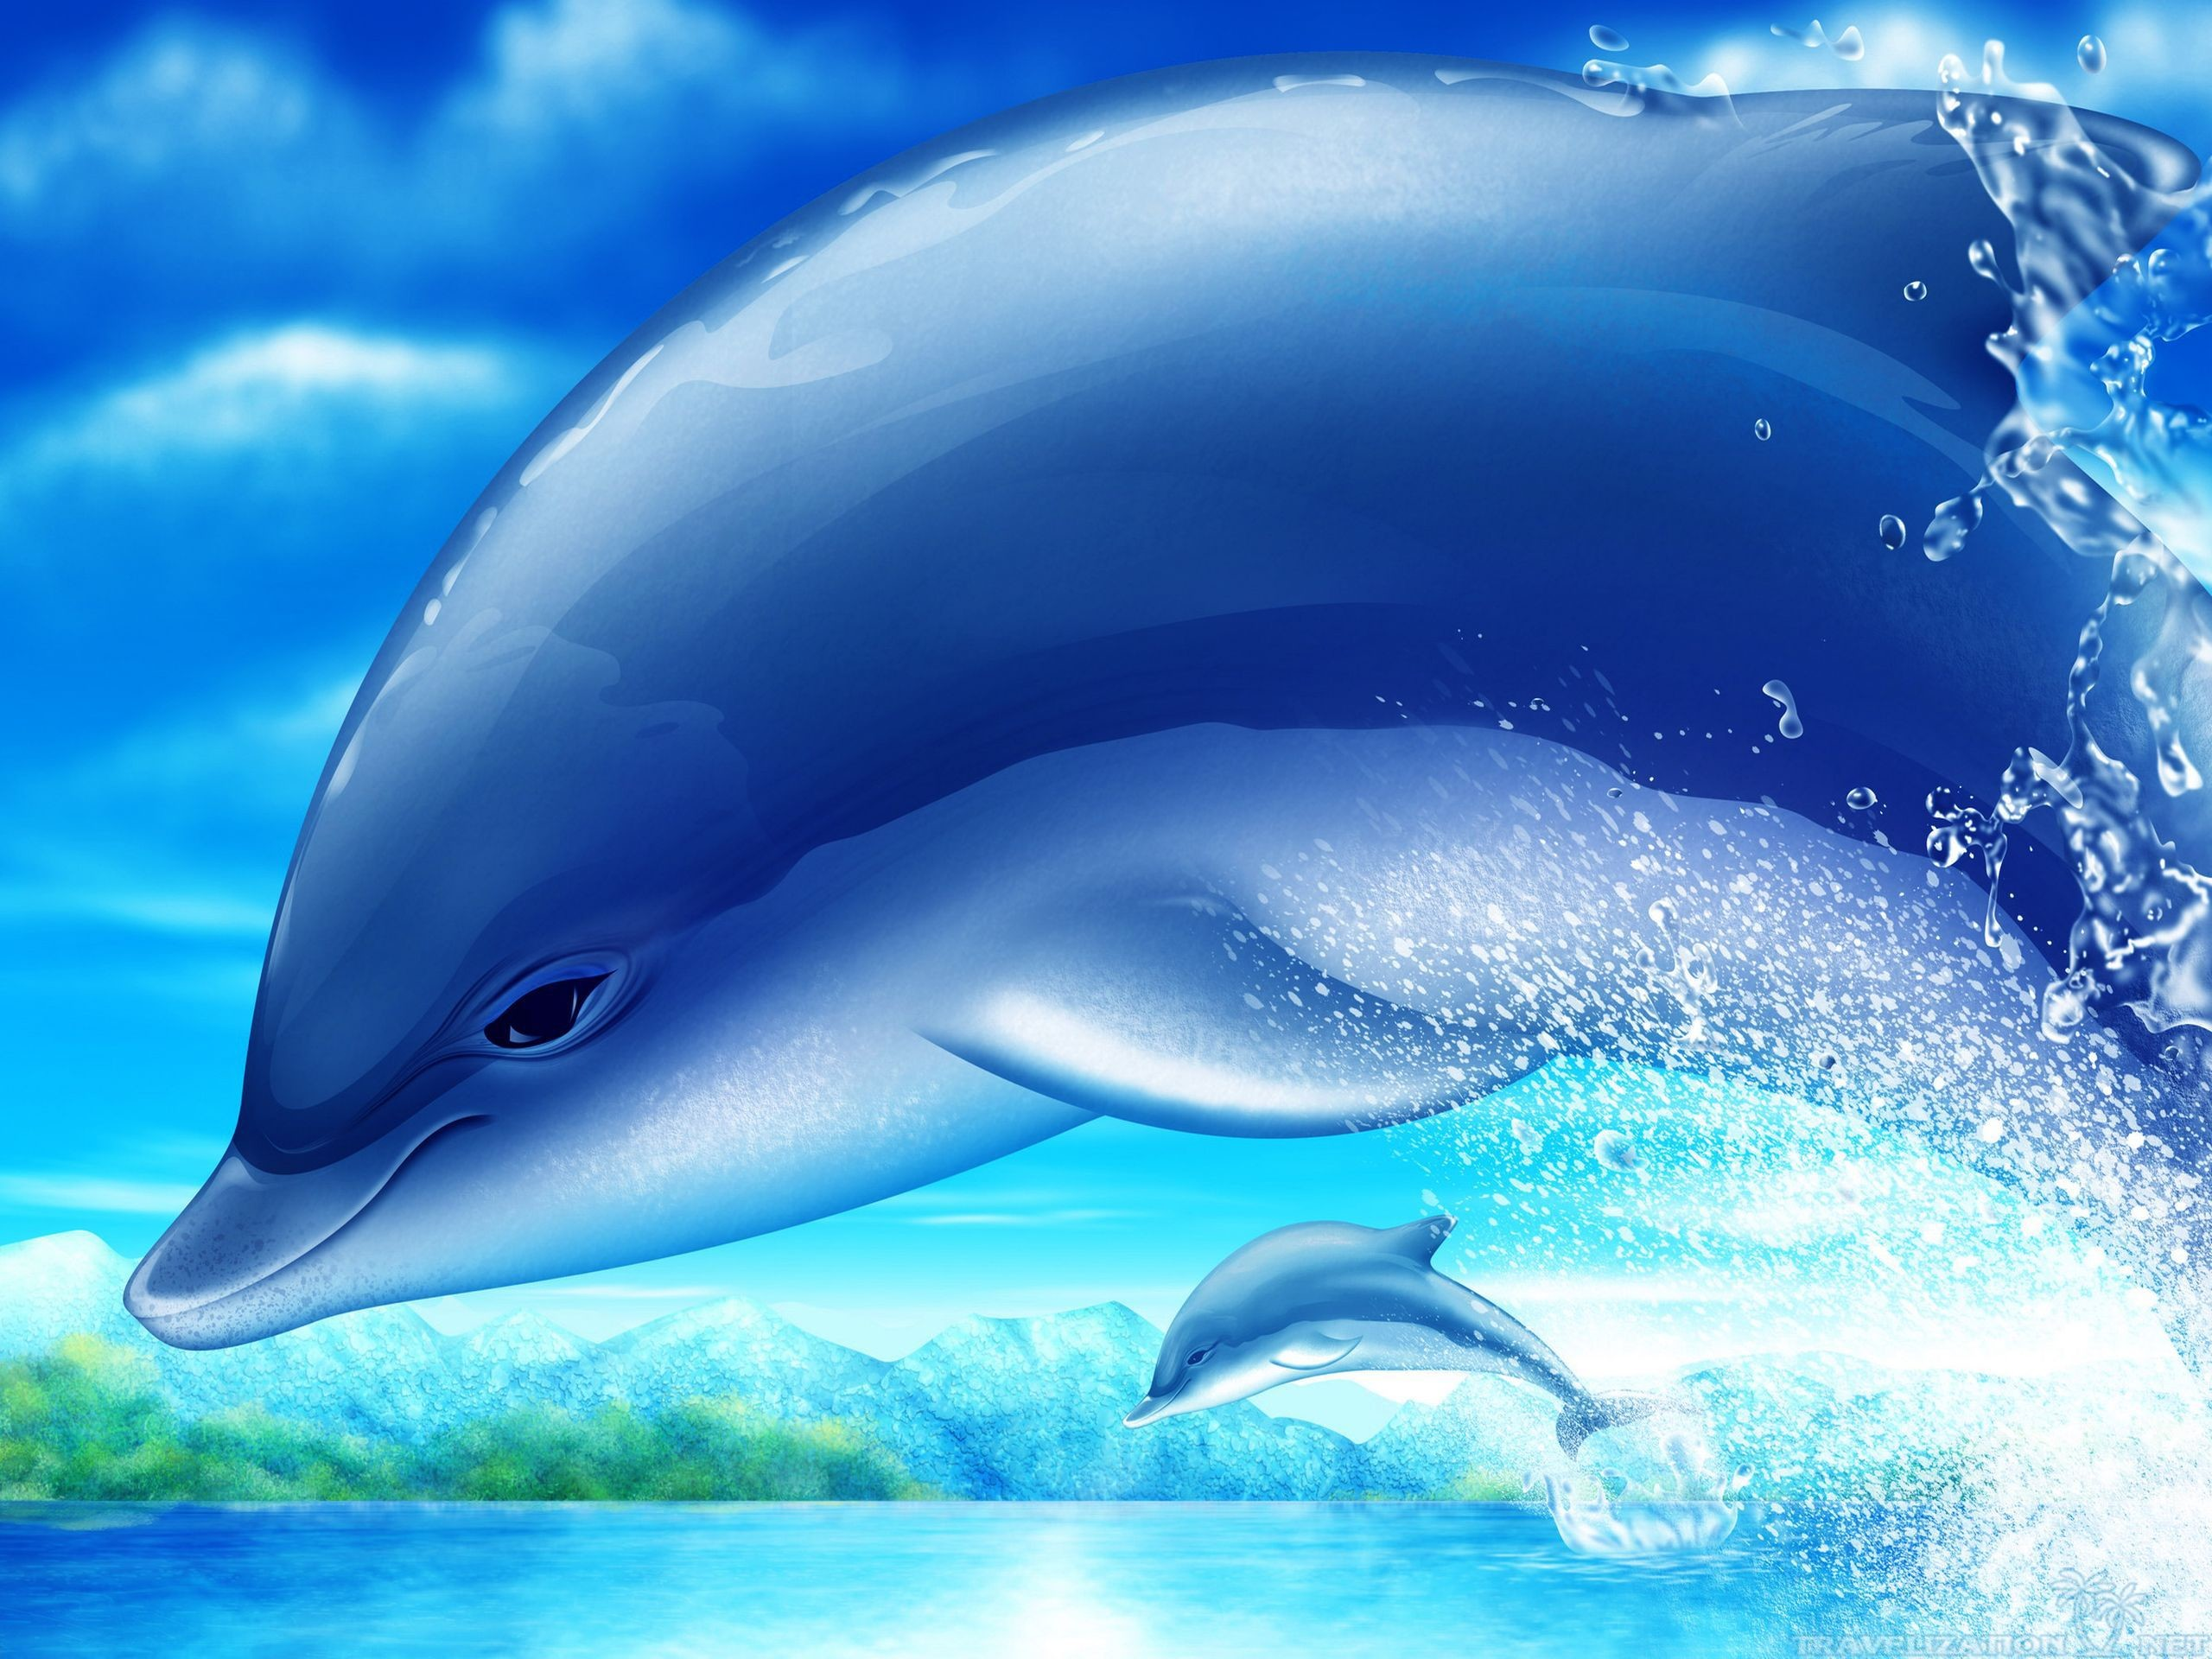 cute dolphin wallpaper 183�� wallpapertag